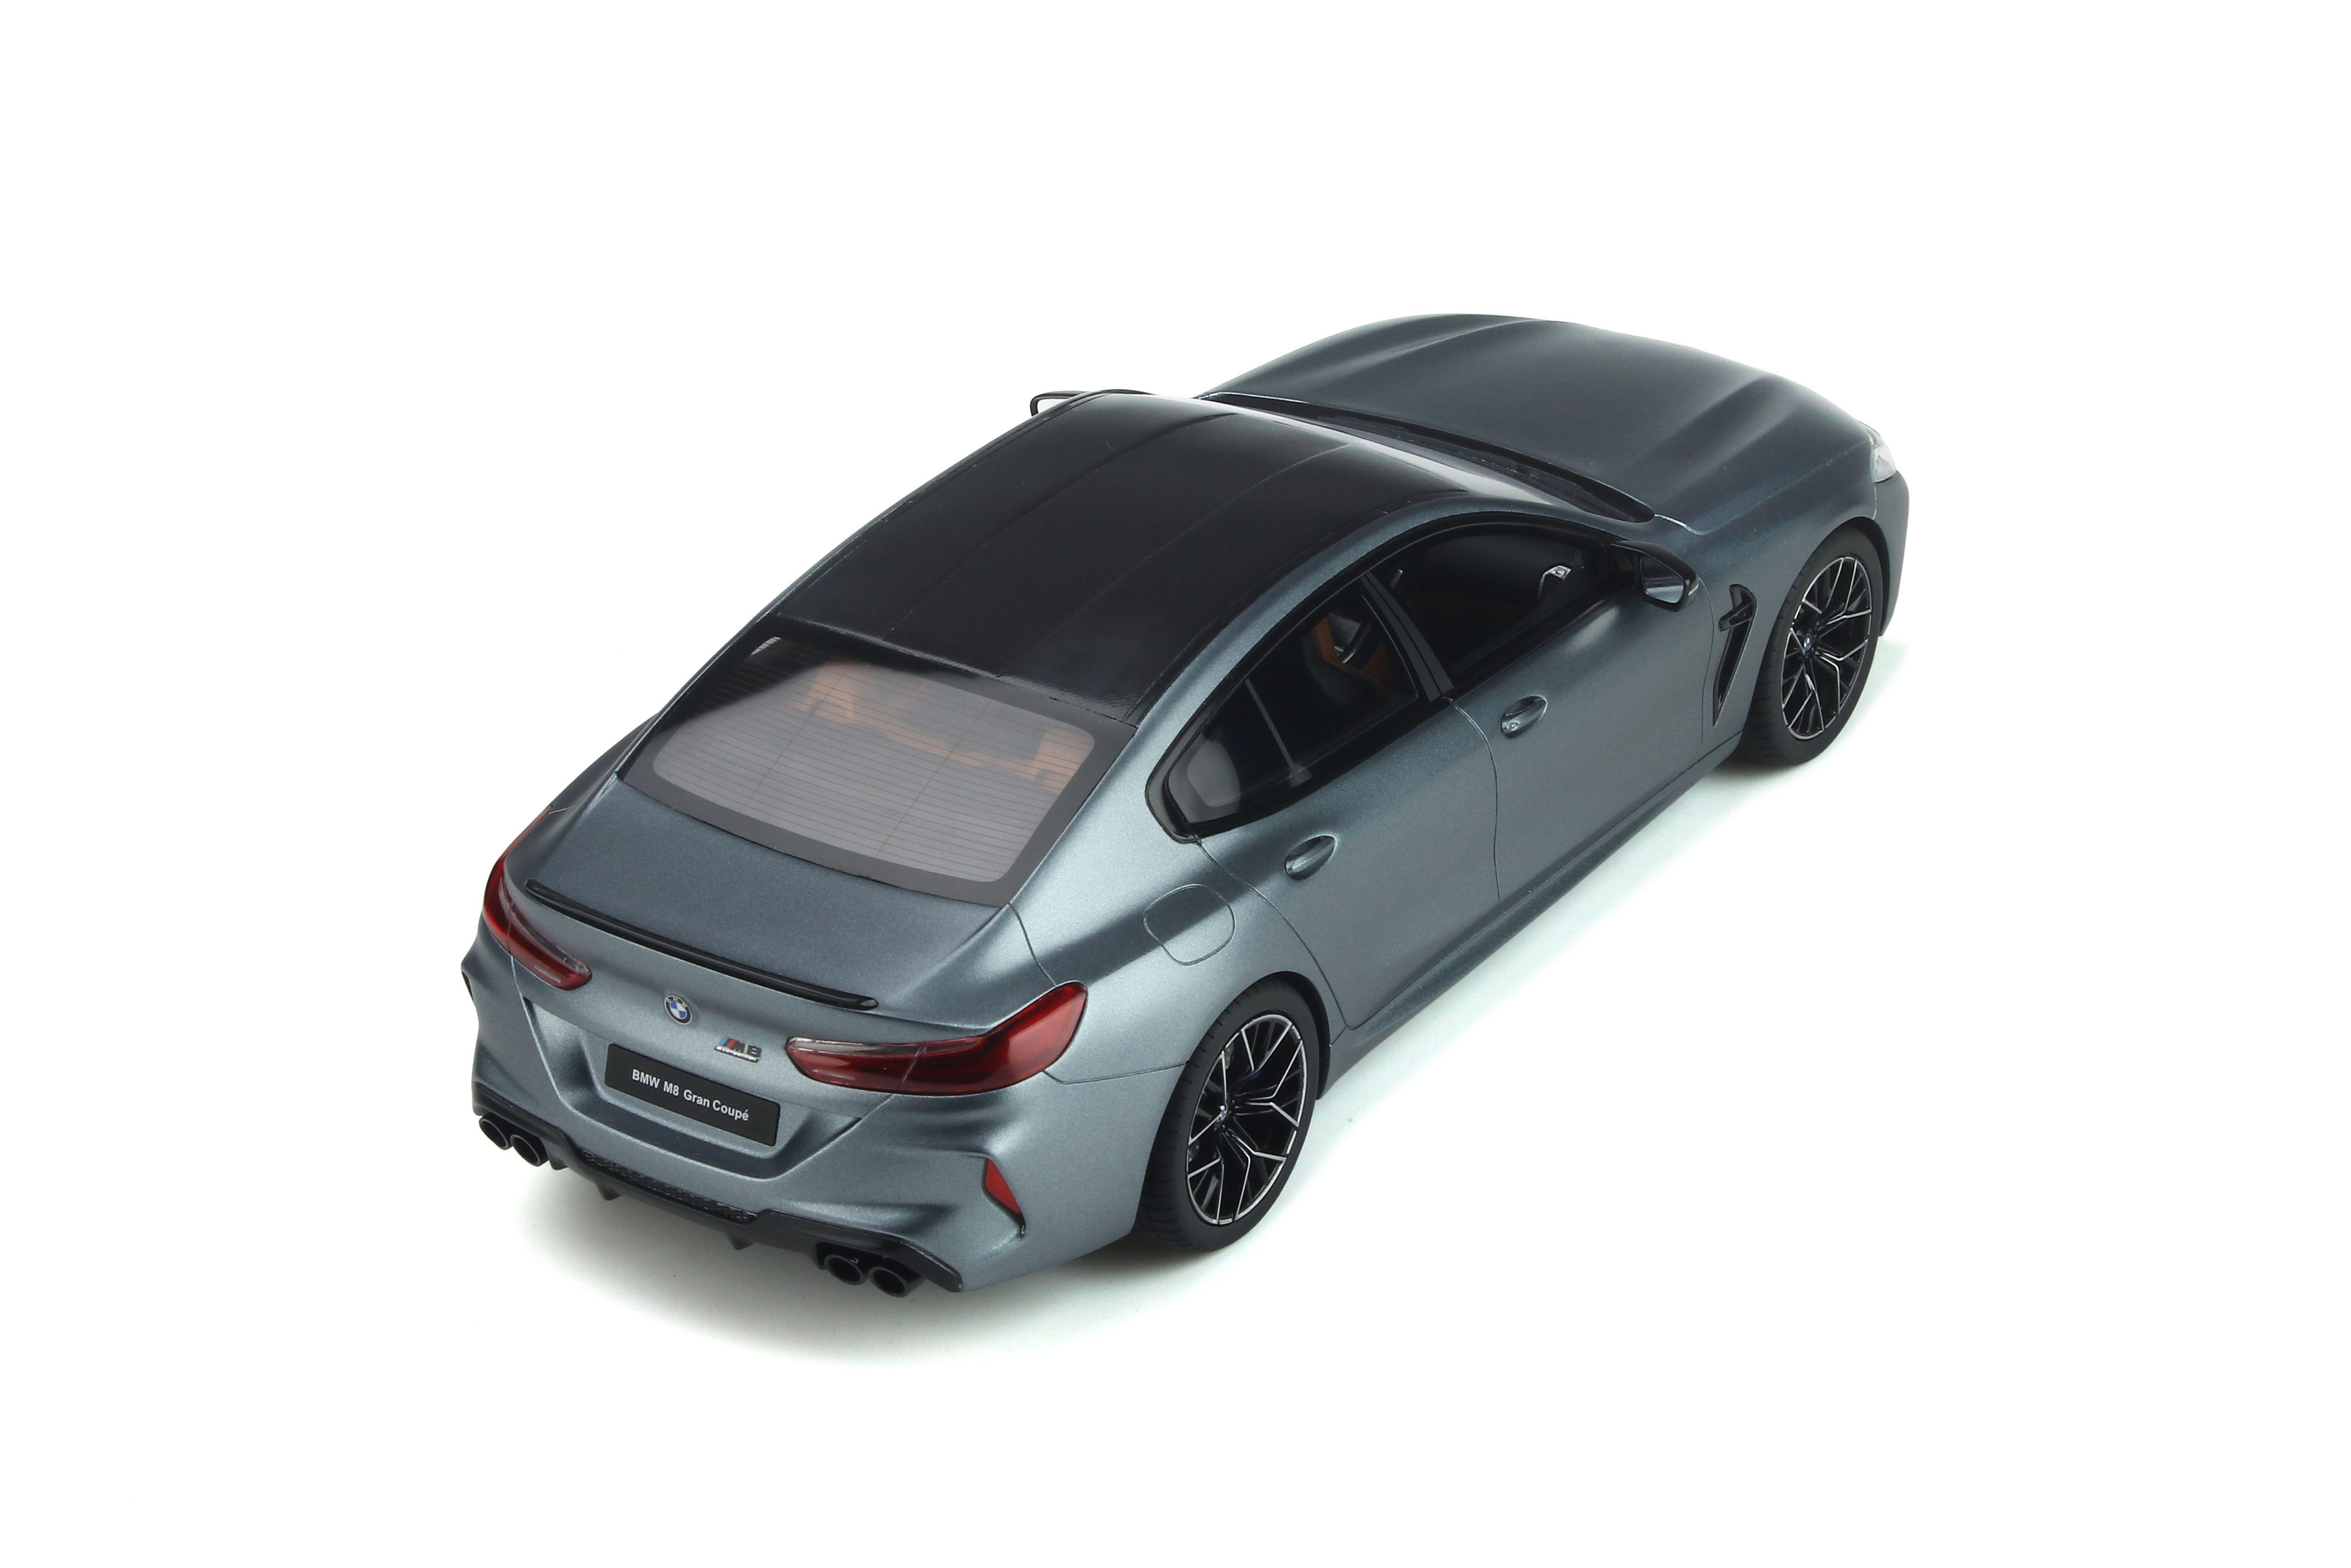 1 18 Bmw M8 Gran Coupe Competition Package Frozen Bluestone Metallic 2020